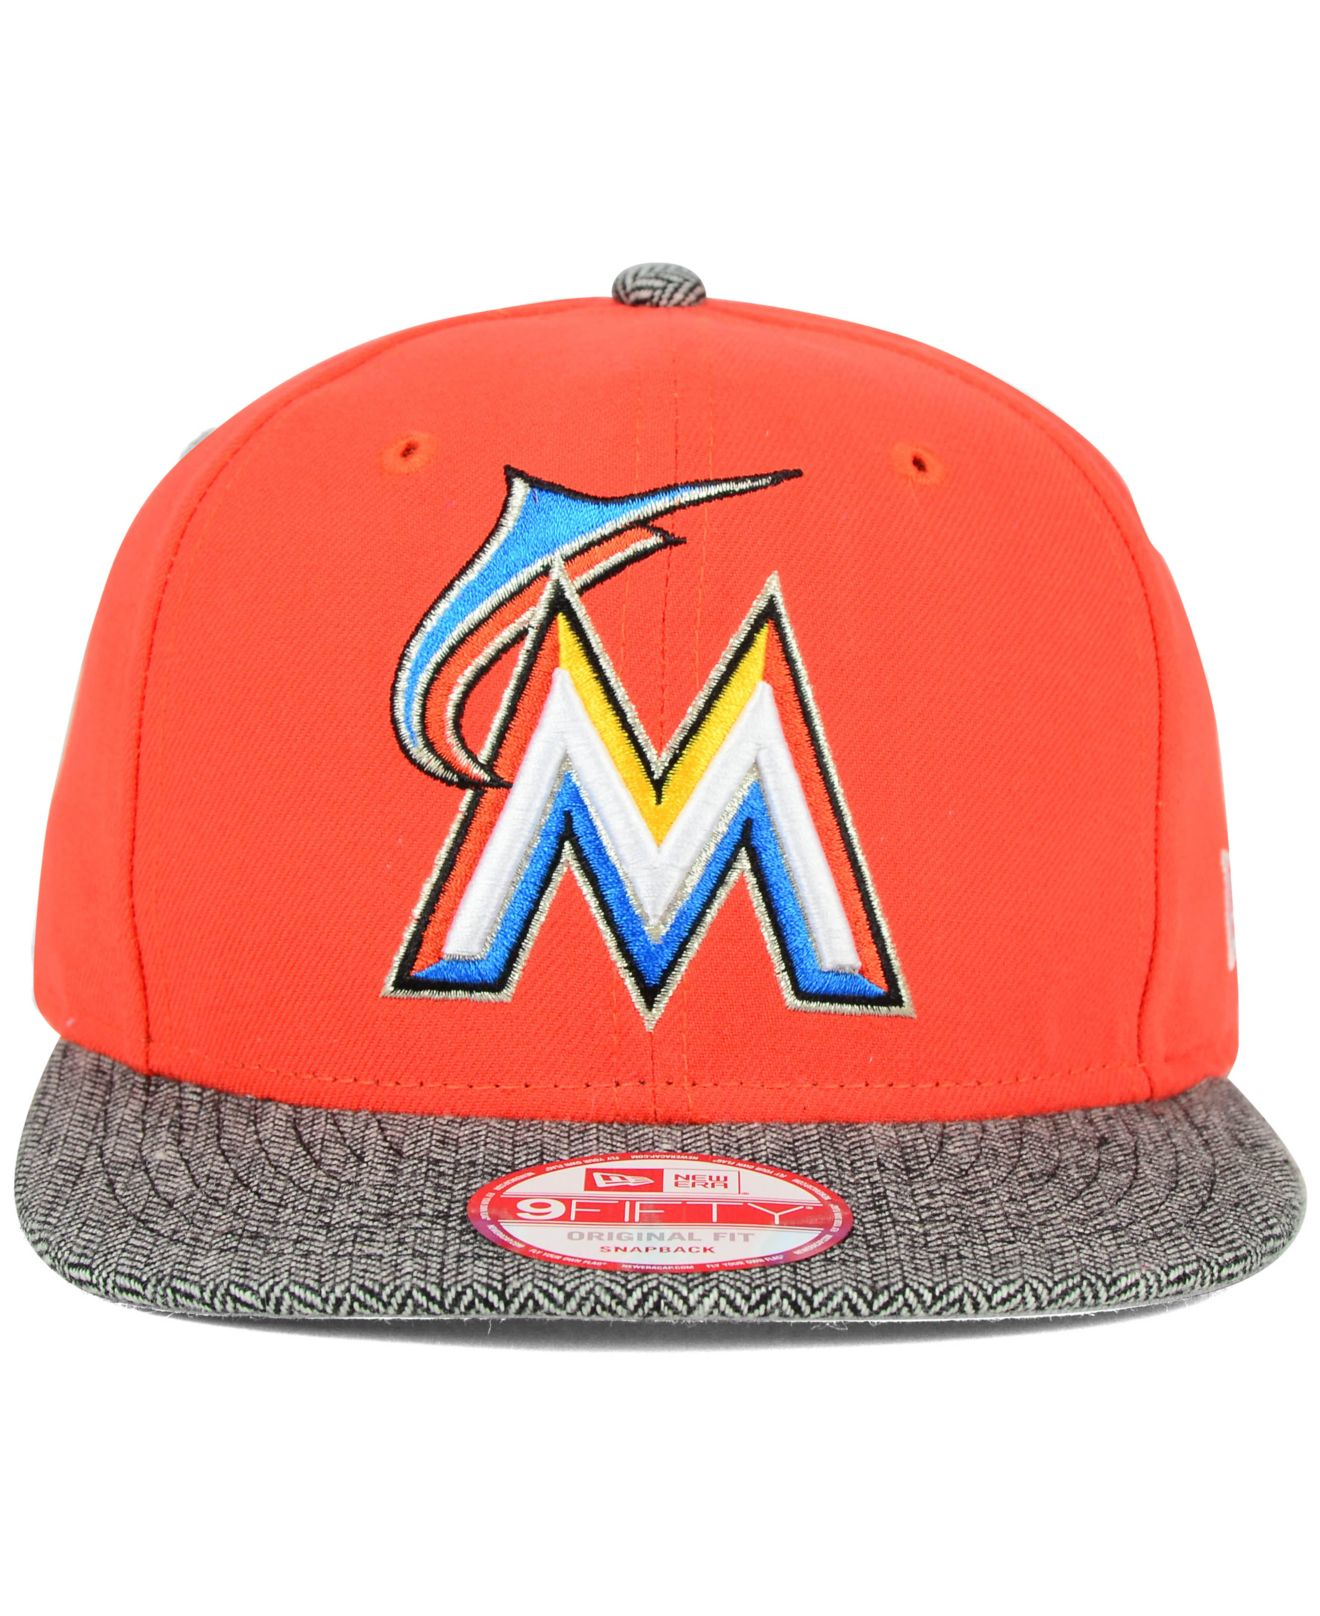 8d394dfb ... switzerland lyst ktz miami marlins premium 9fifty snapback cap in  orange for men 17cb6 510ff